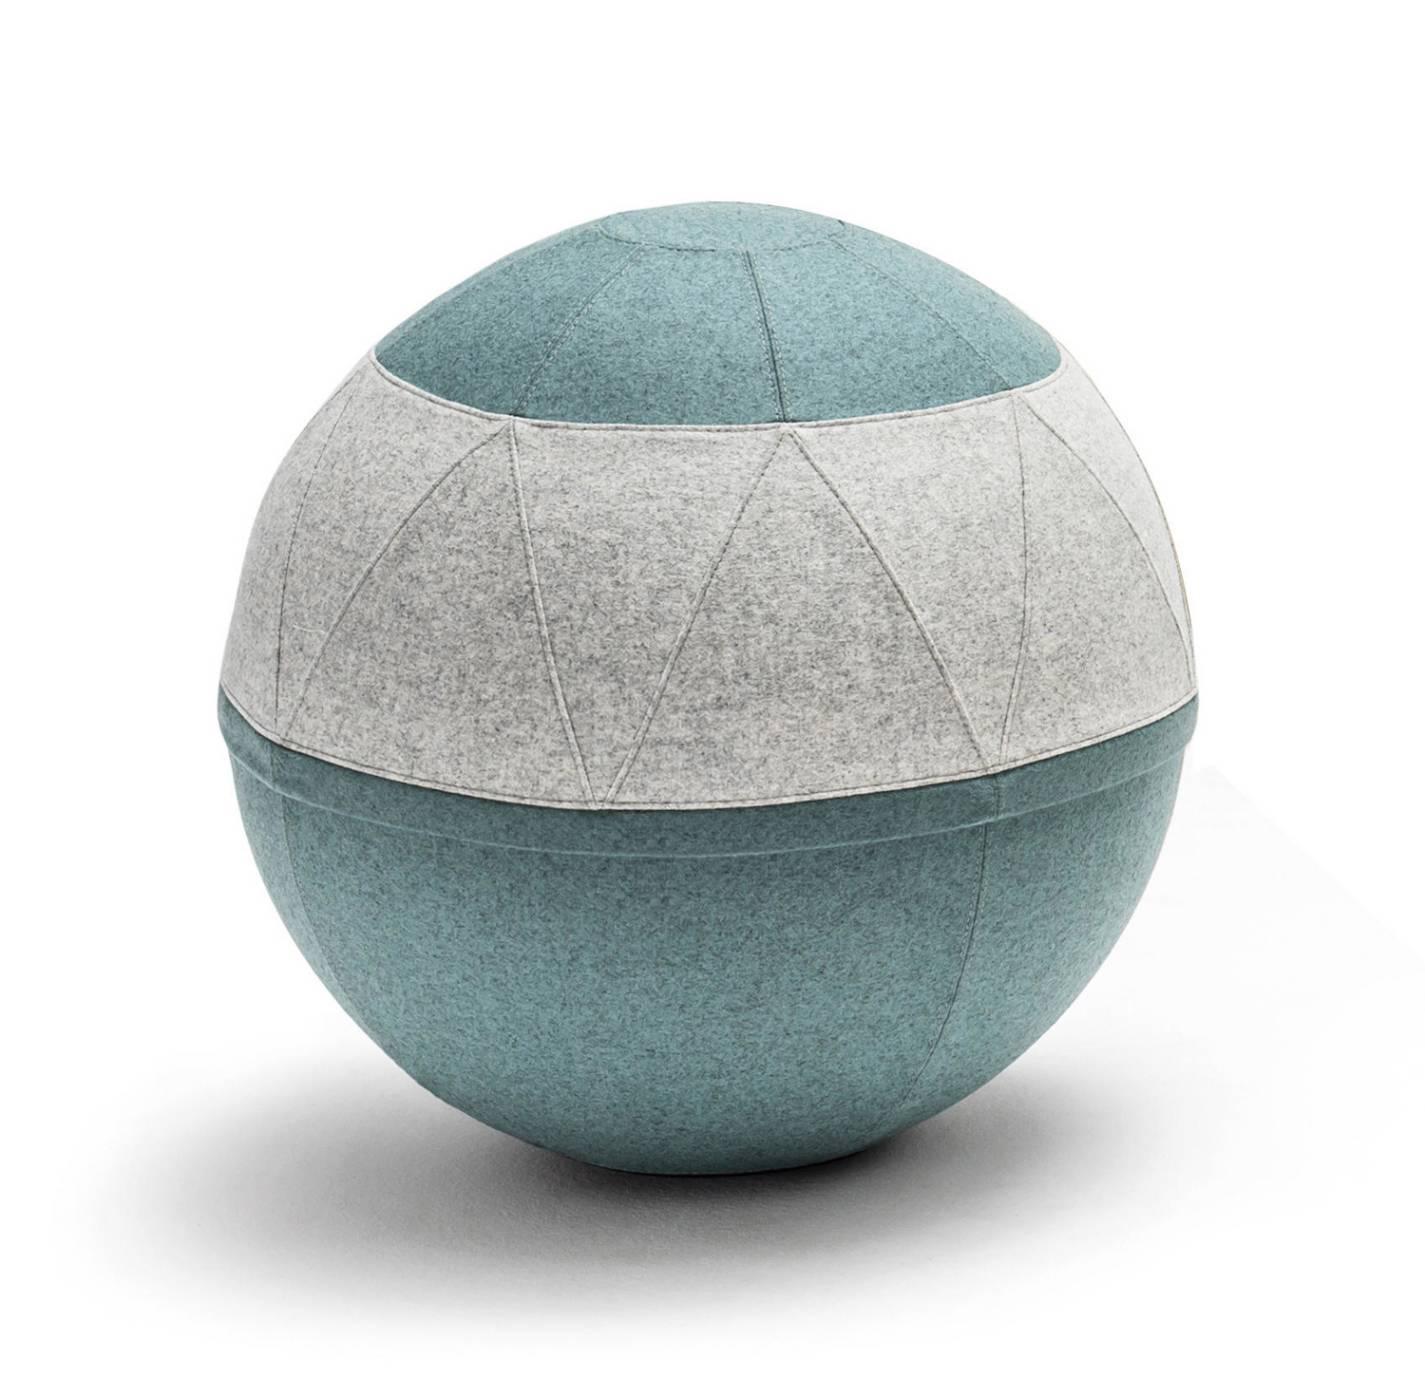 Noti Rollo Classy Sitzball Design Möbel